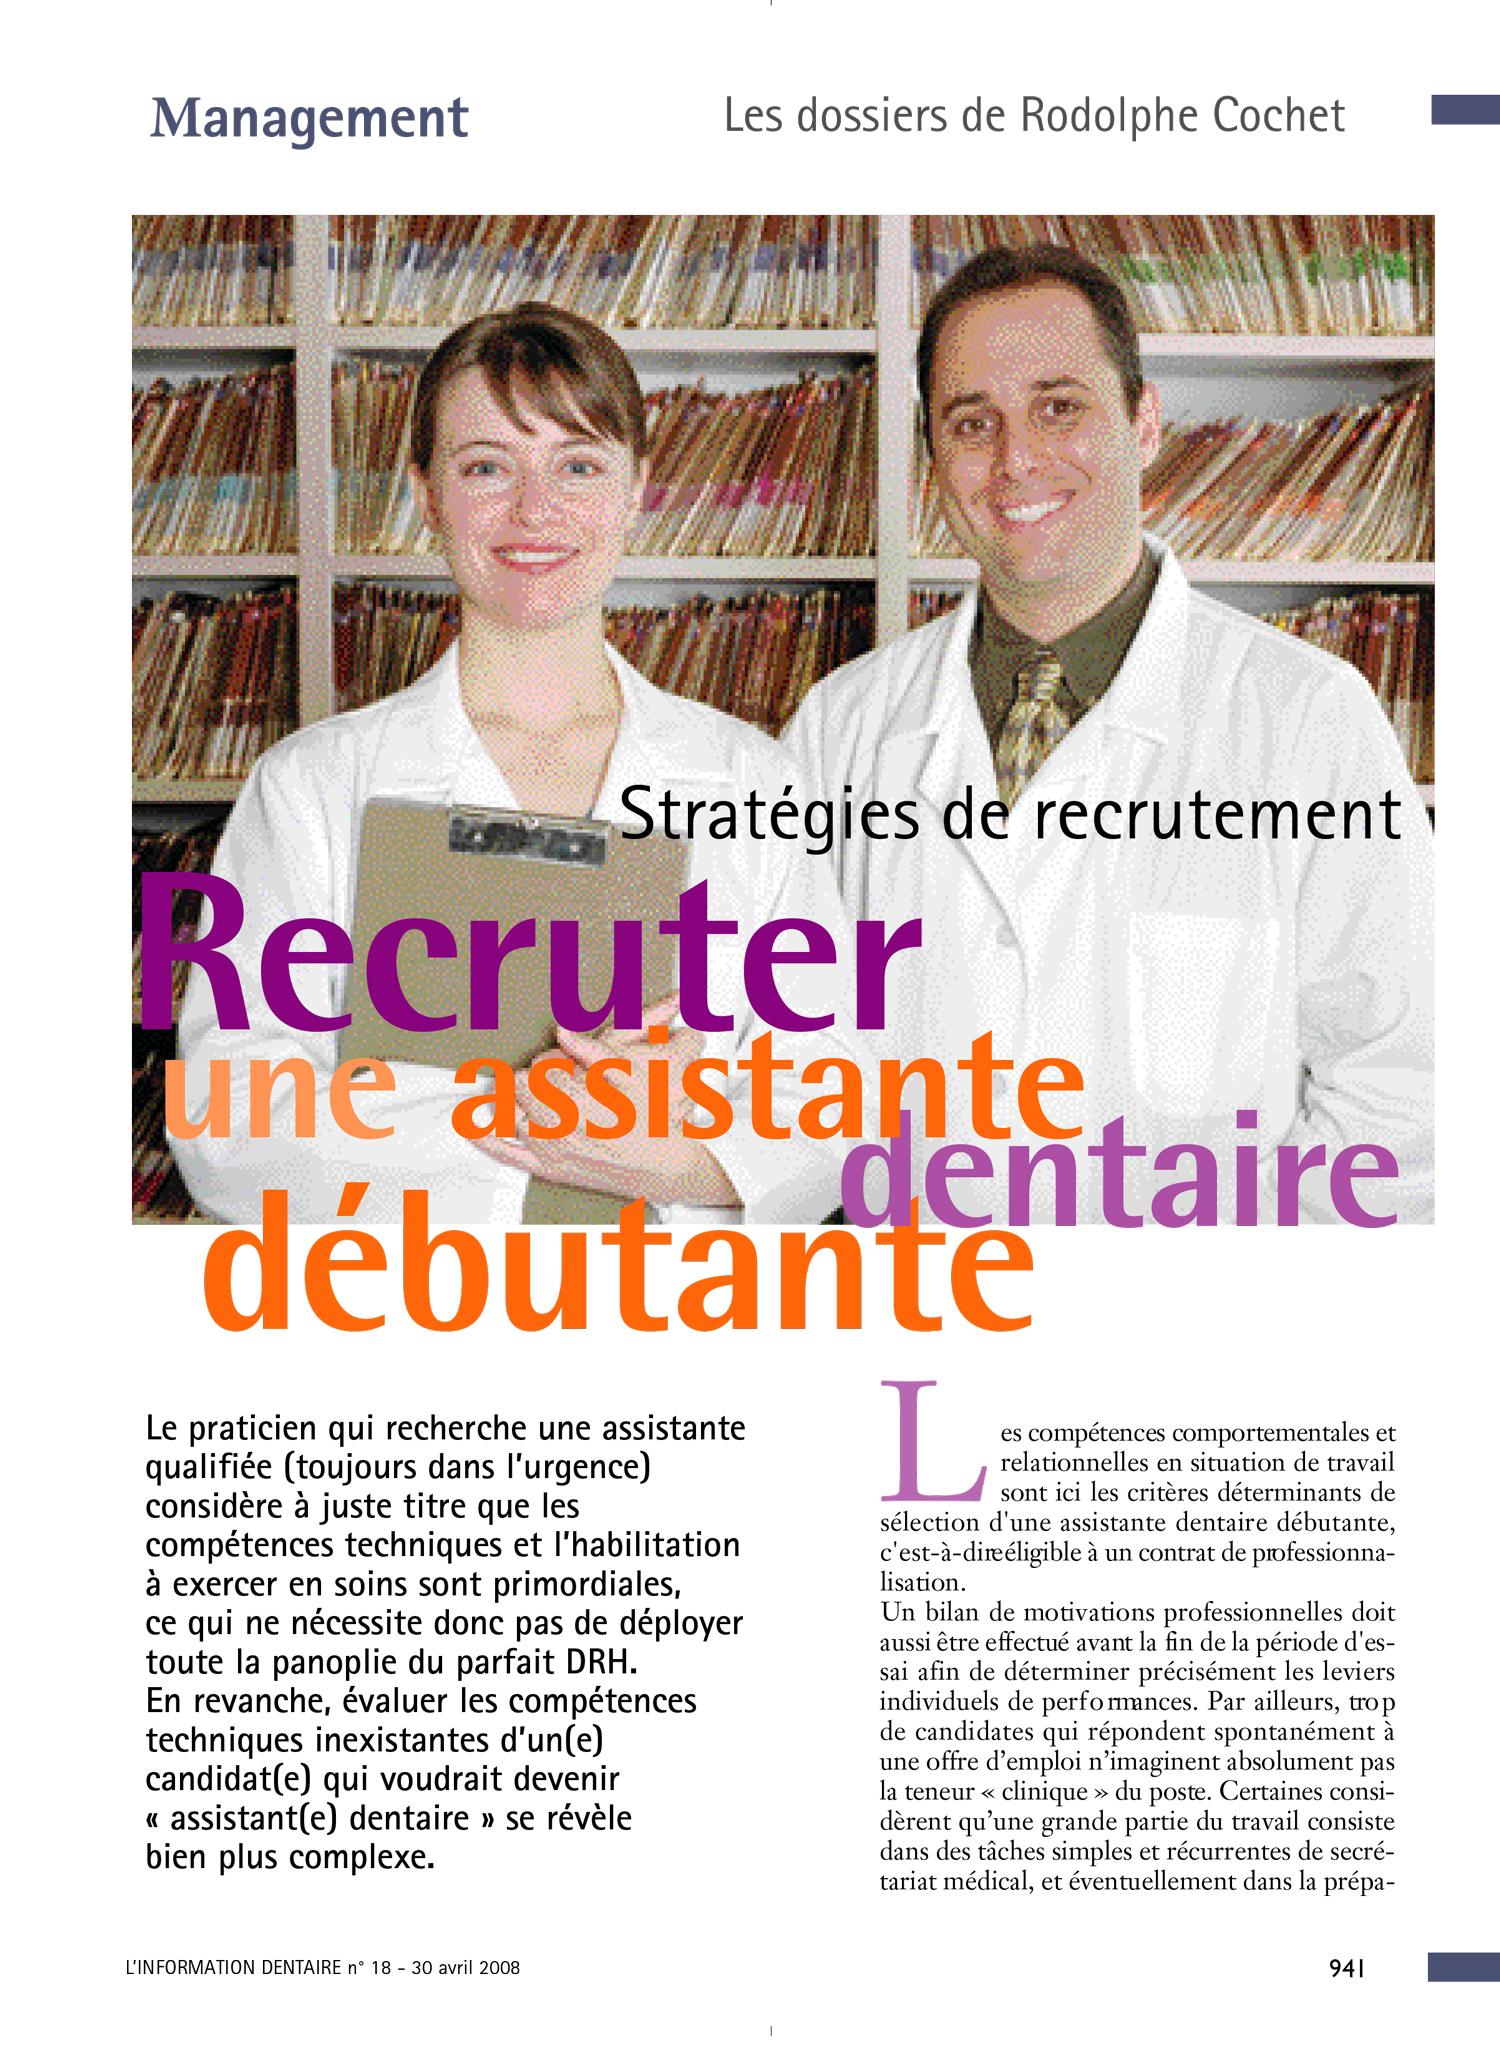 Recruter_une_assistante_dentaire_debutante_stagiaire_cnqaos-1.jpg